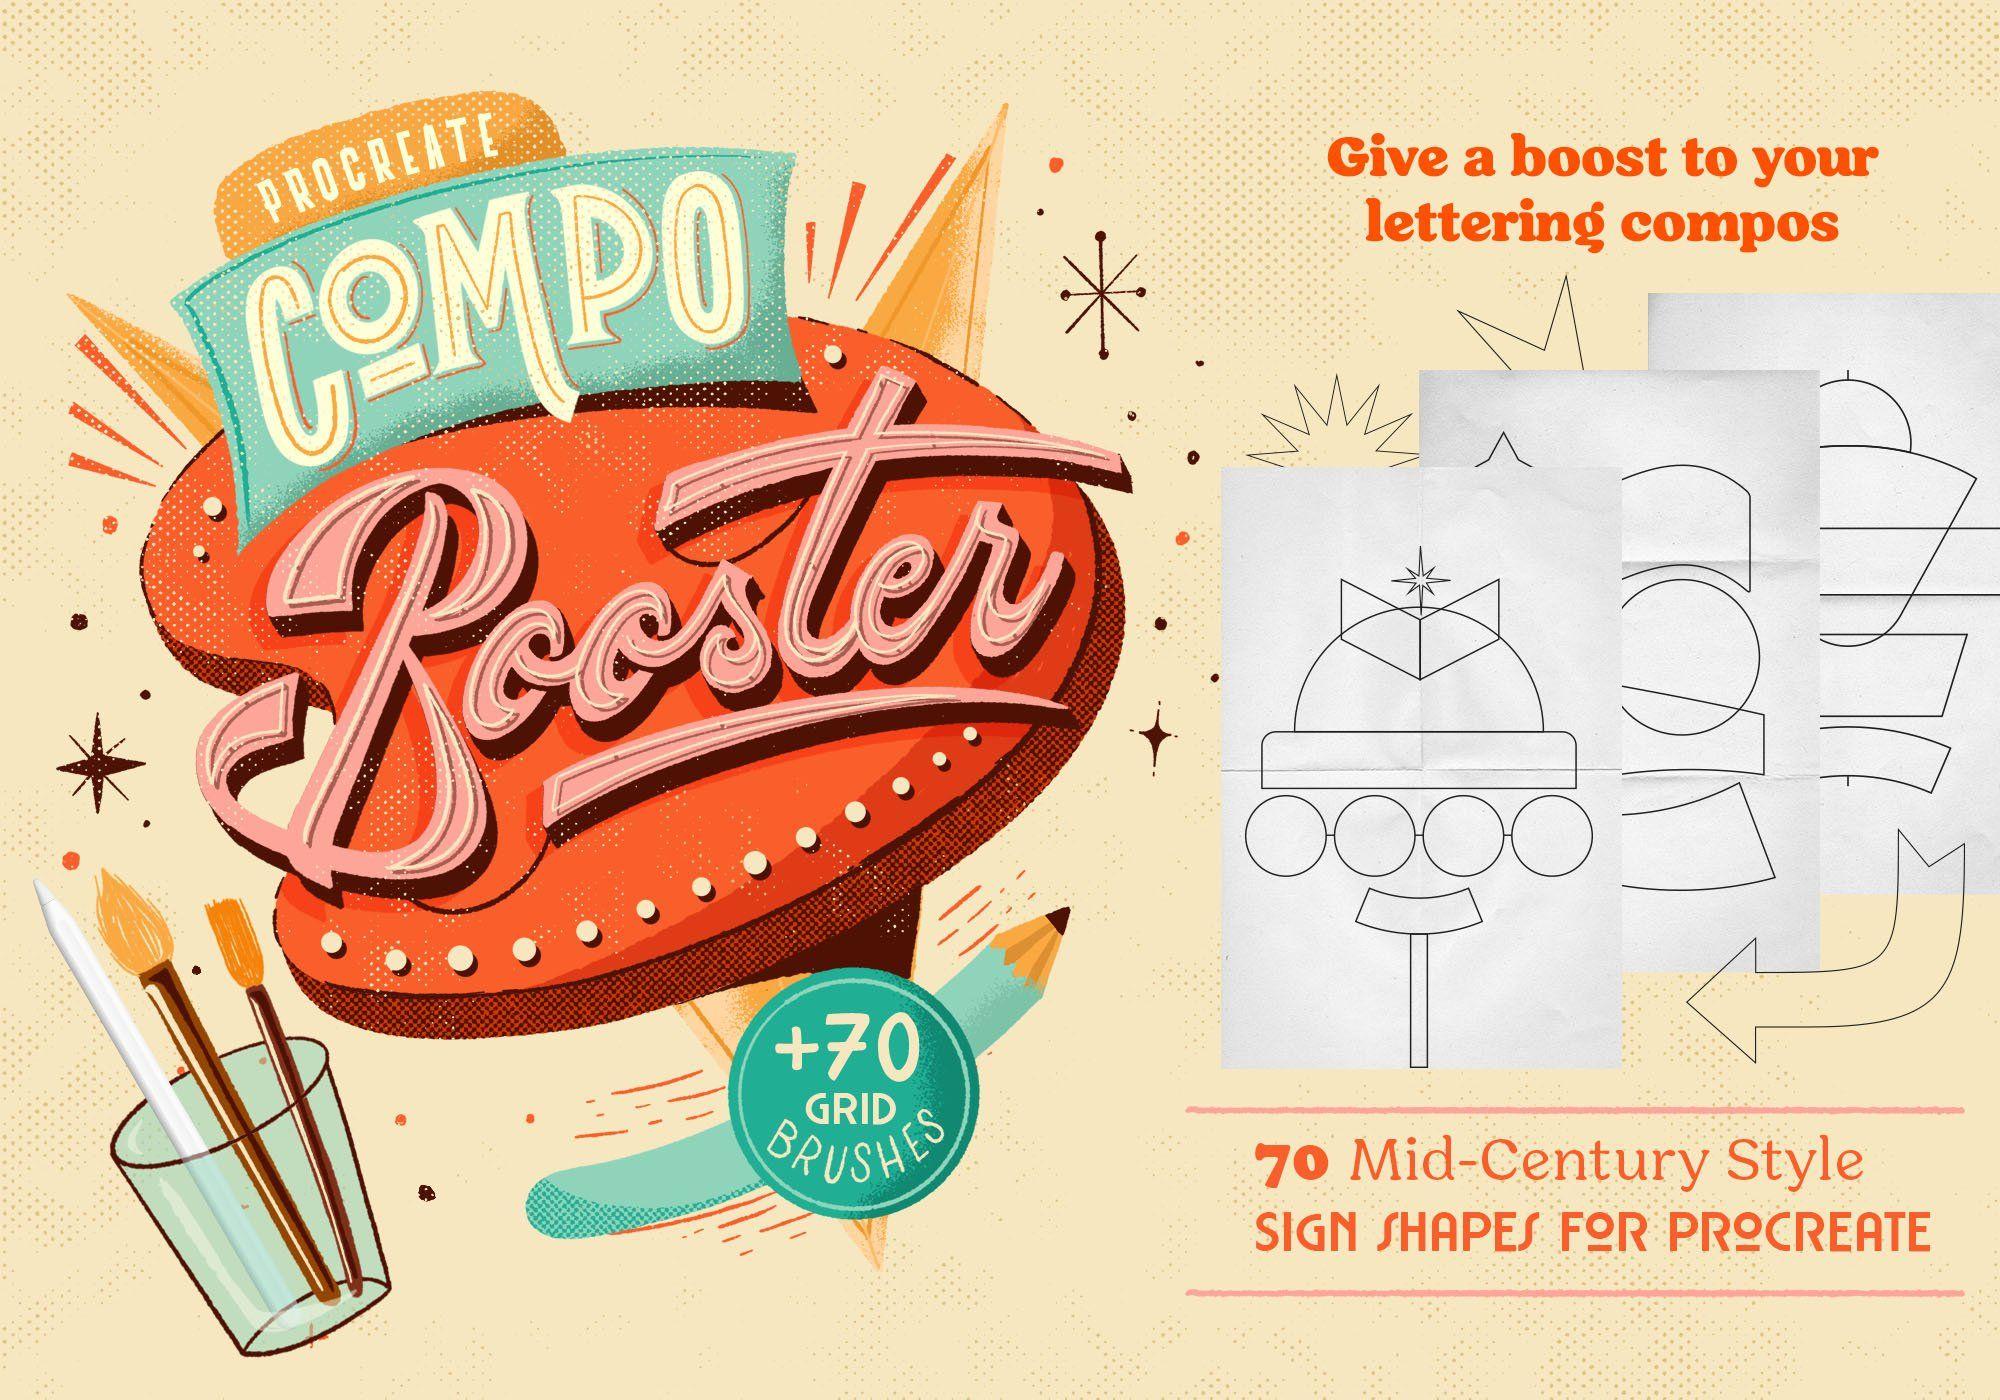 Compobooster Procreate Retro Brushes In 2020 Ipad Pro Apple Pencil Graphic Design Resources Neon Signs